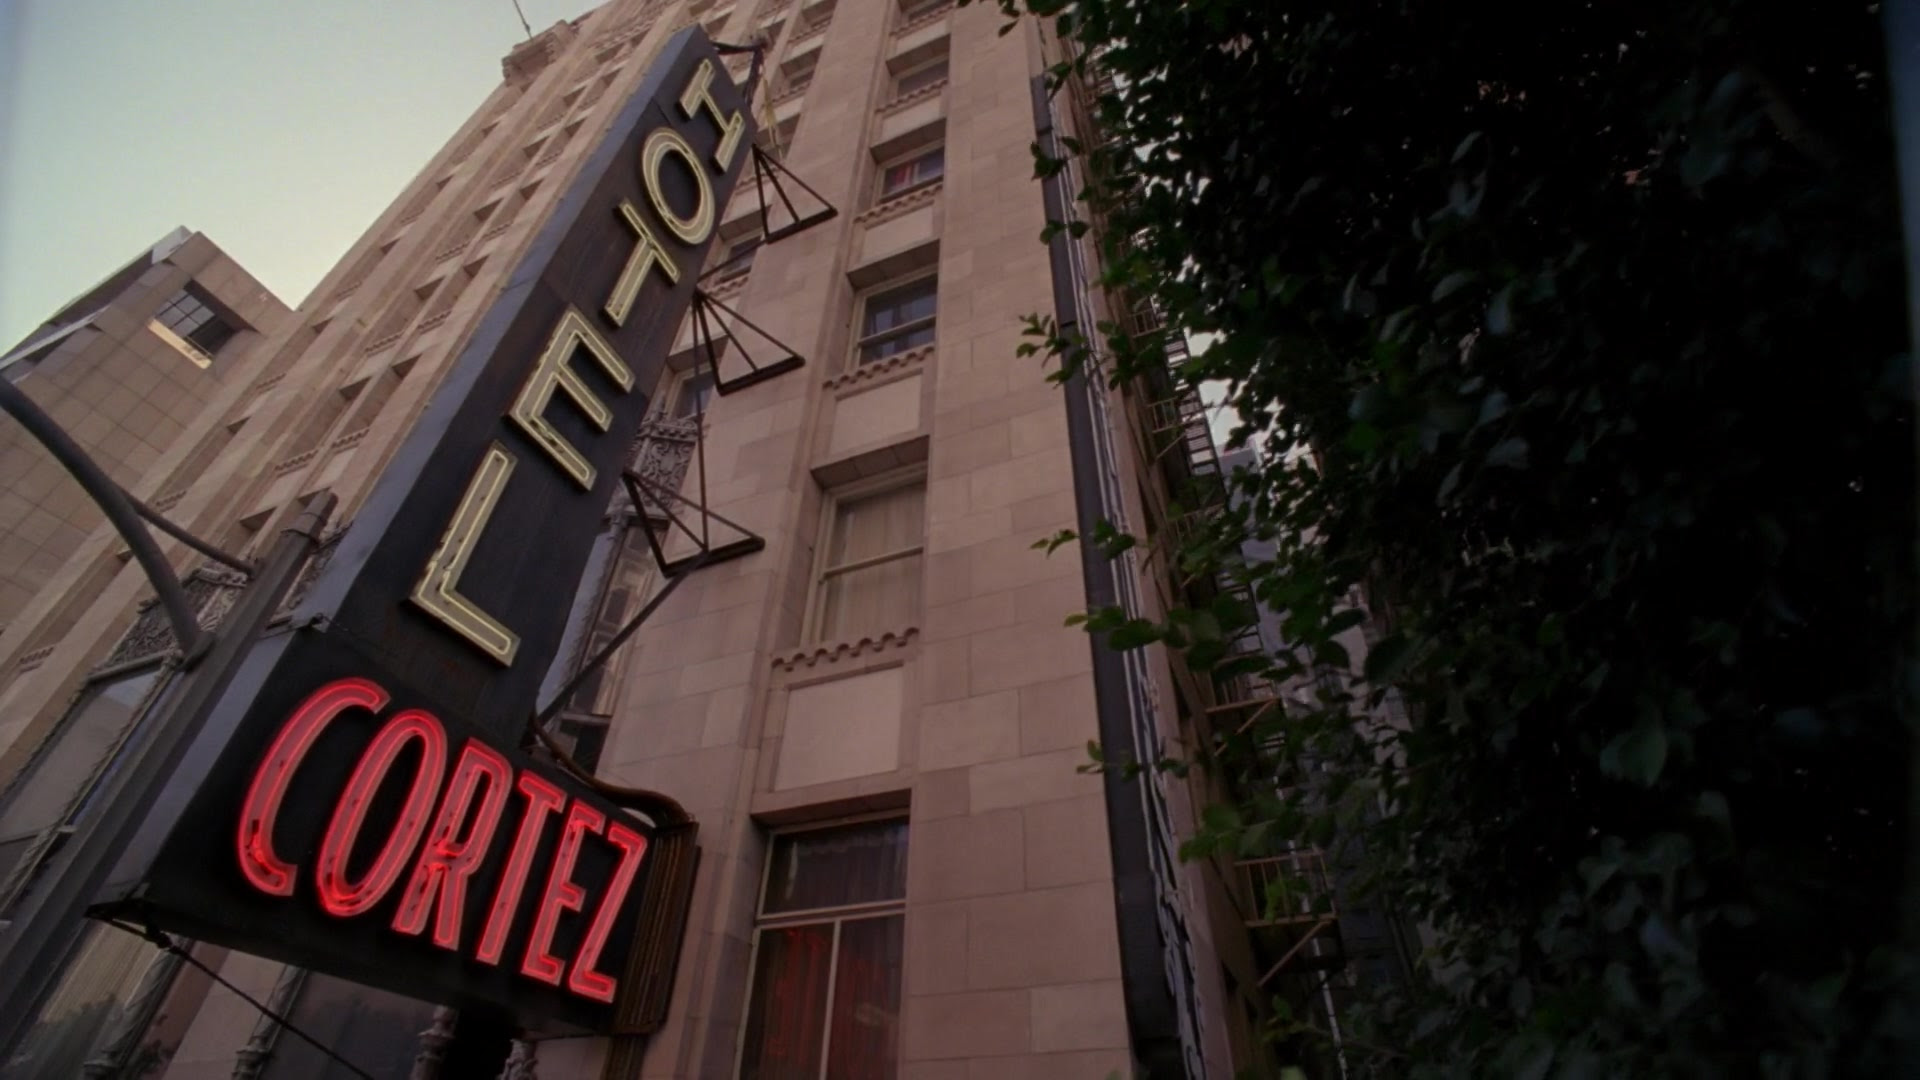 Resultado de imagem para american horror story Hotel Cortez